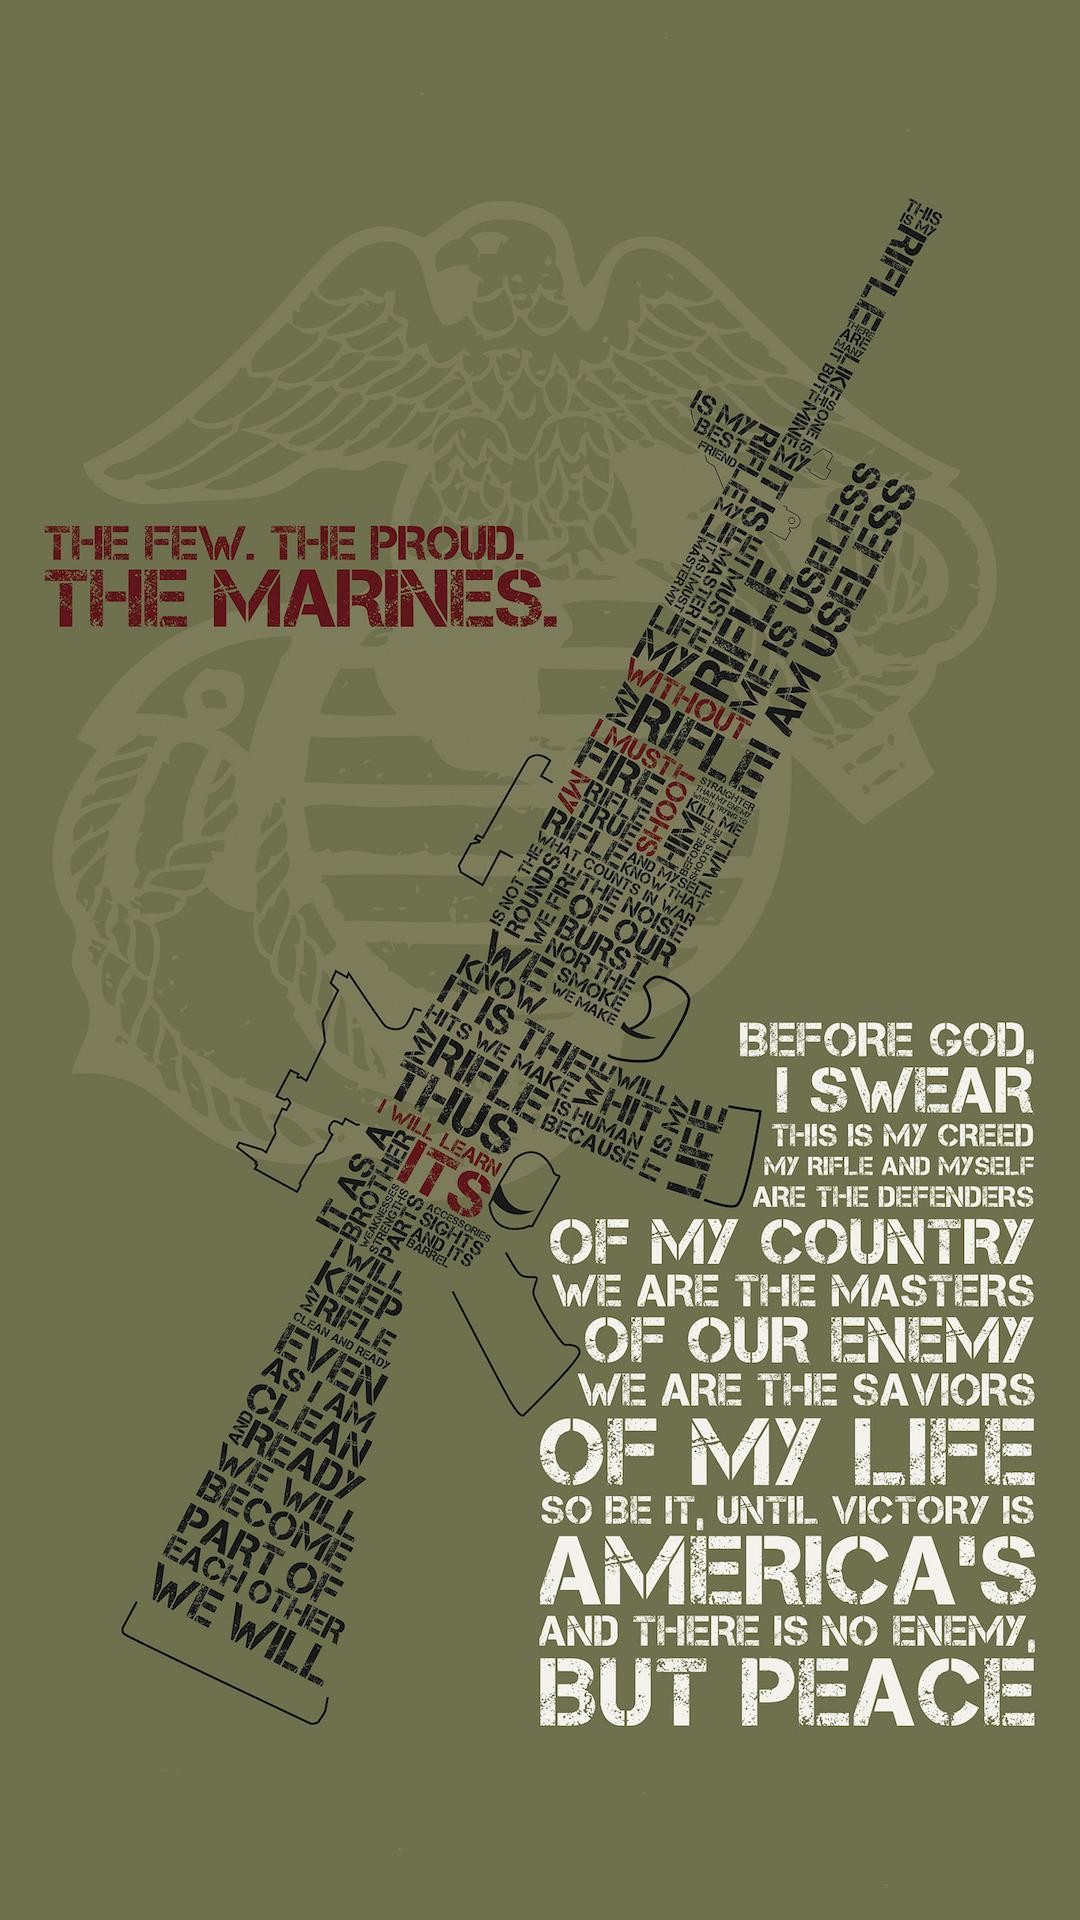 1920x1080 Marine Corps Desktop Backgrounds Hd Wallpaper 1005x754PX .